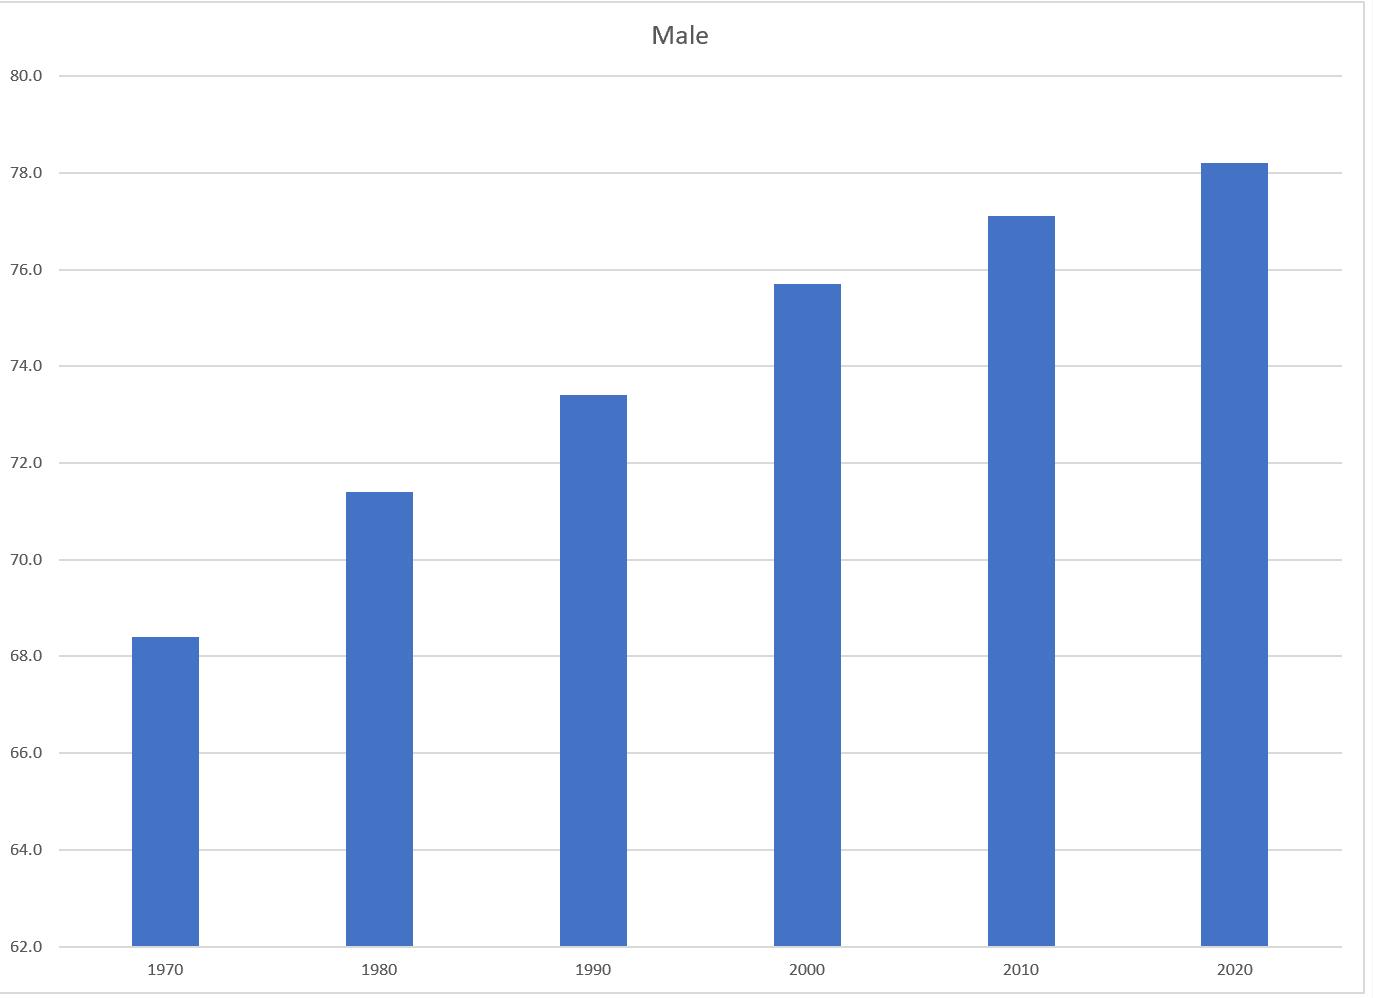 Screenshot of the Male Bar Chart